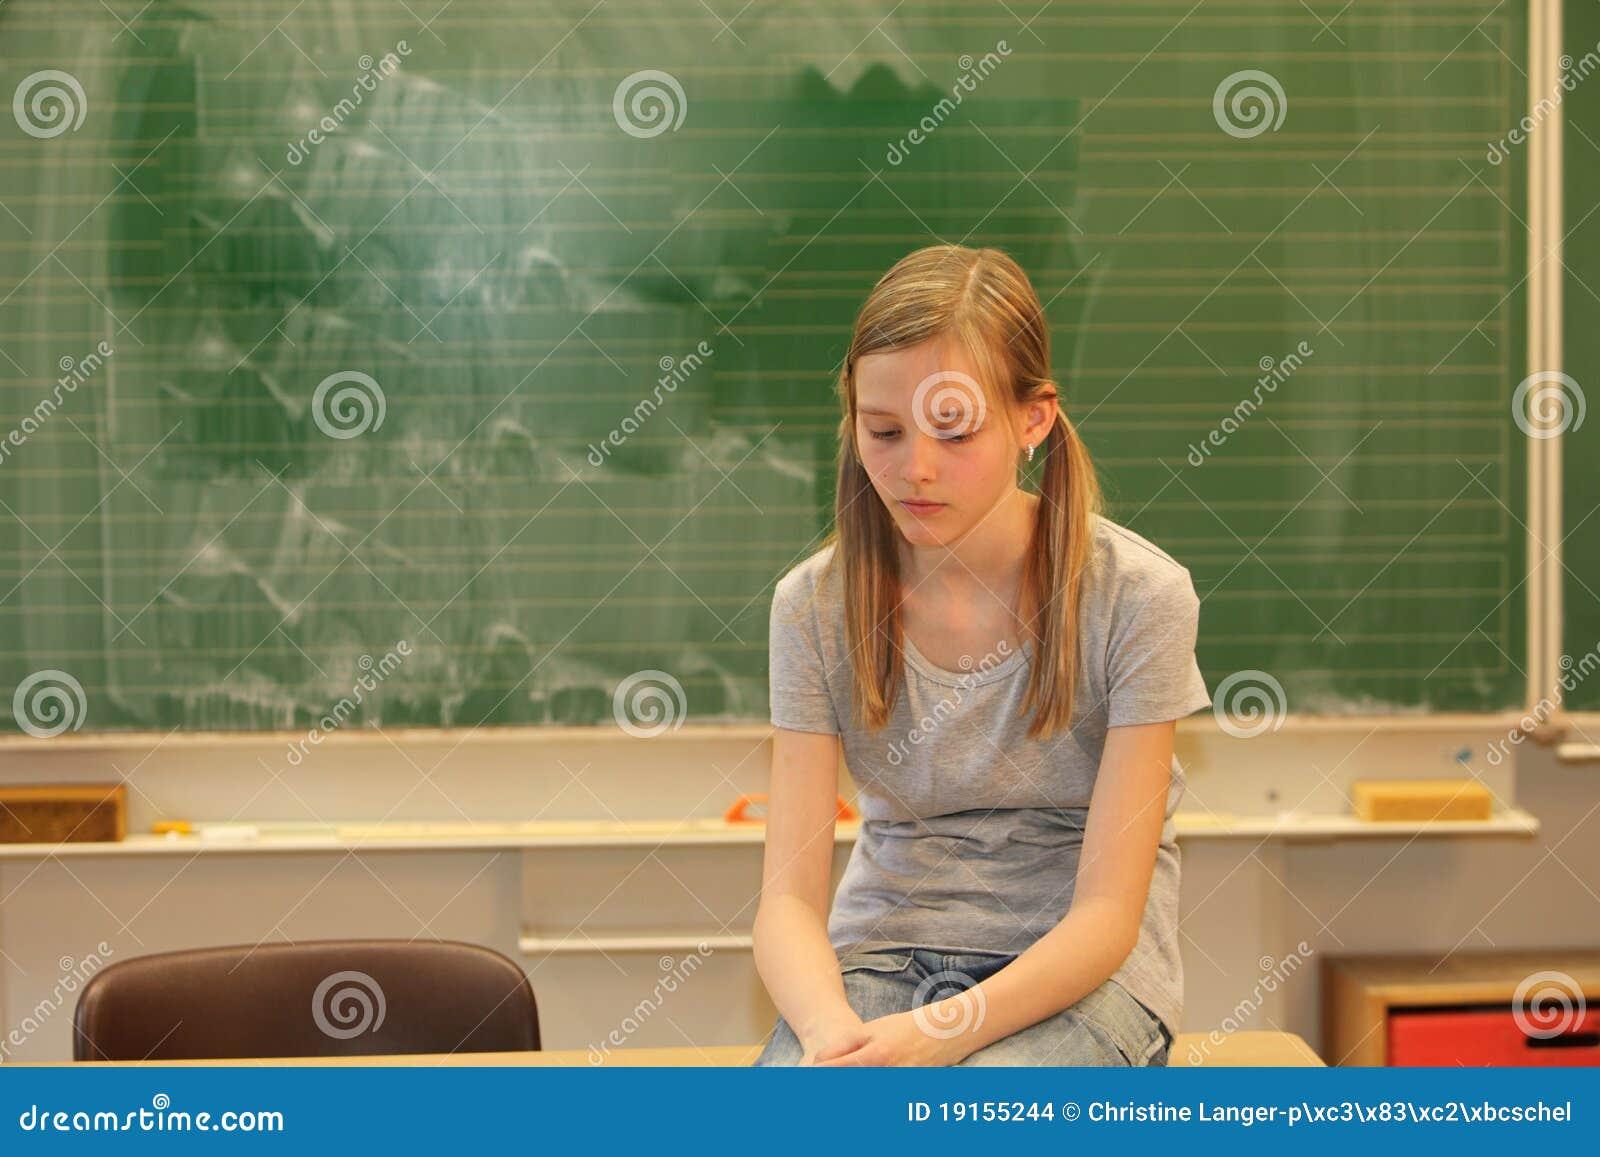 Sad blonde girl in school